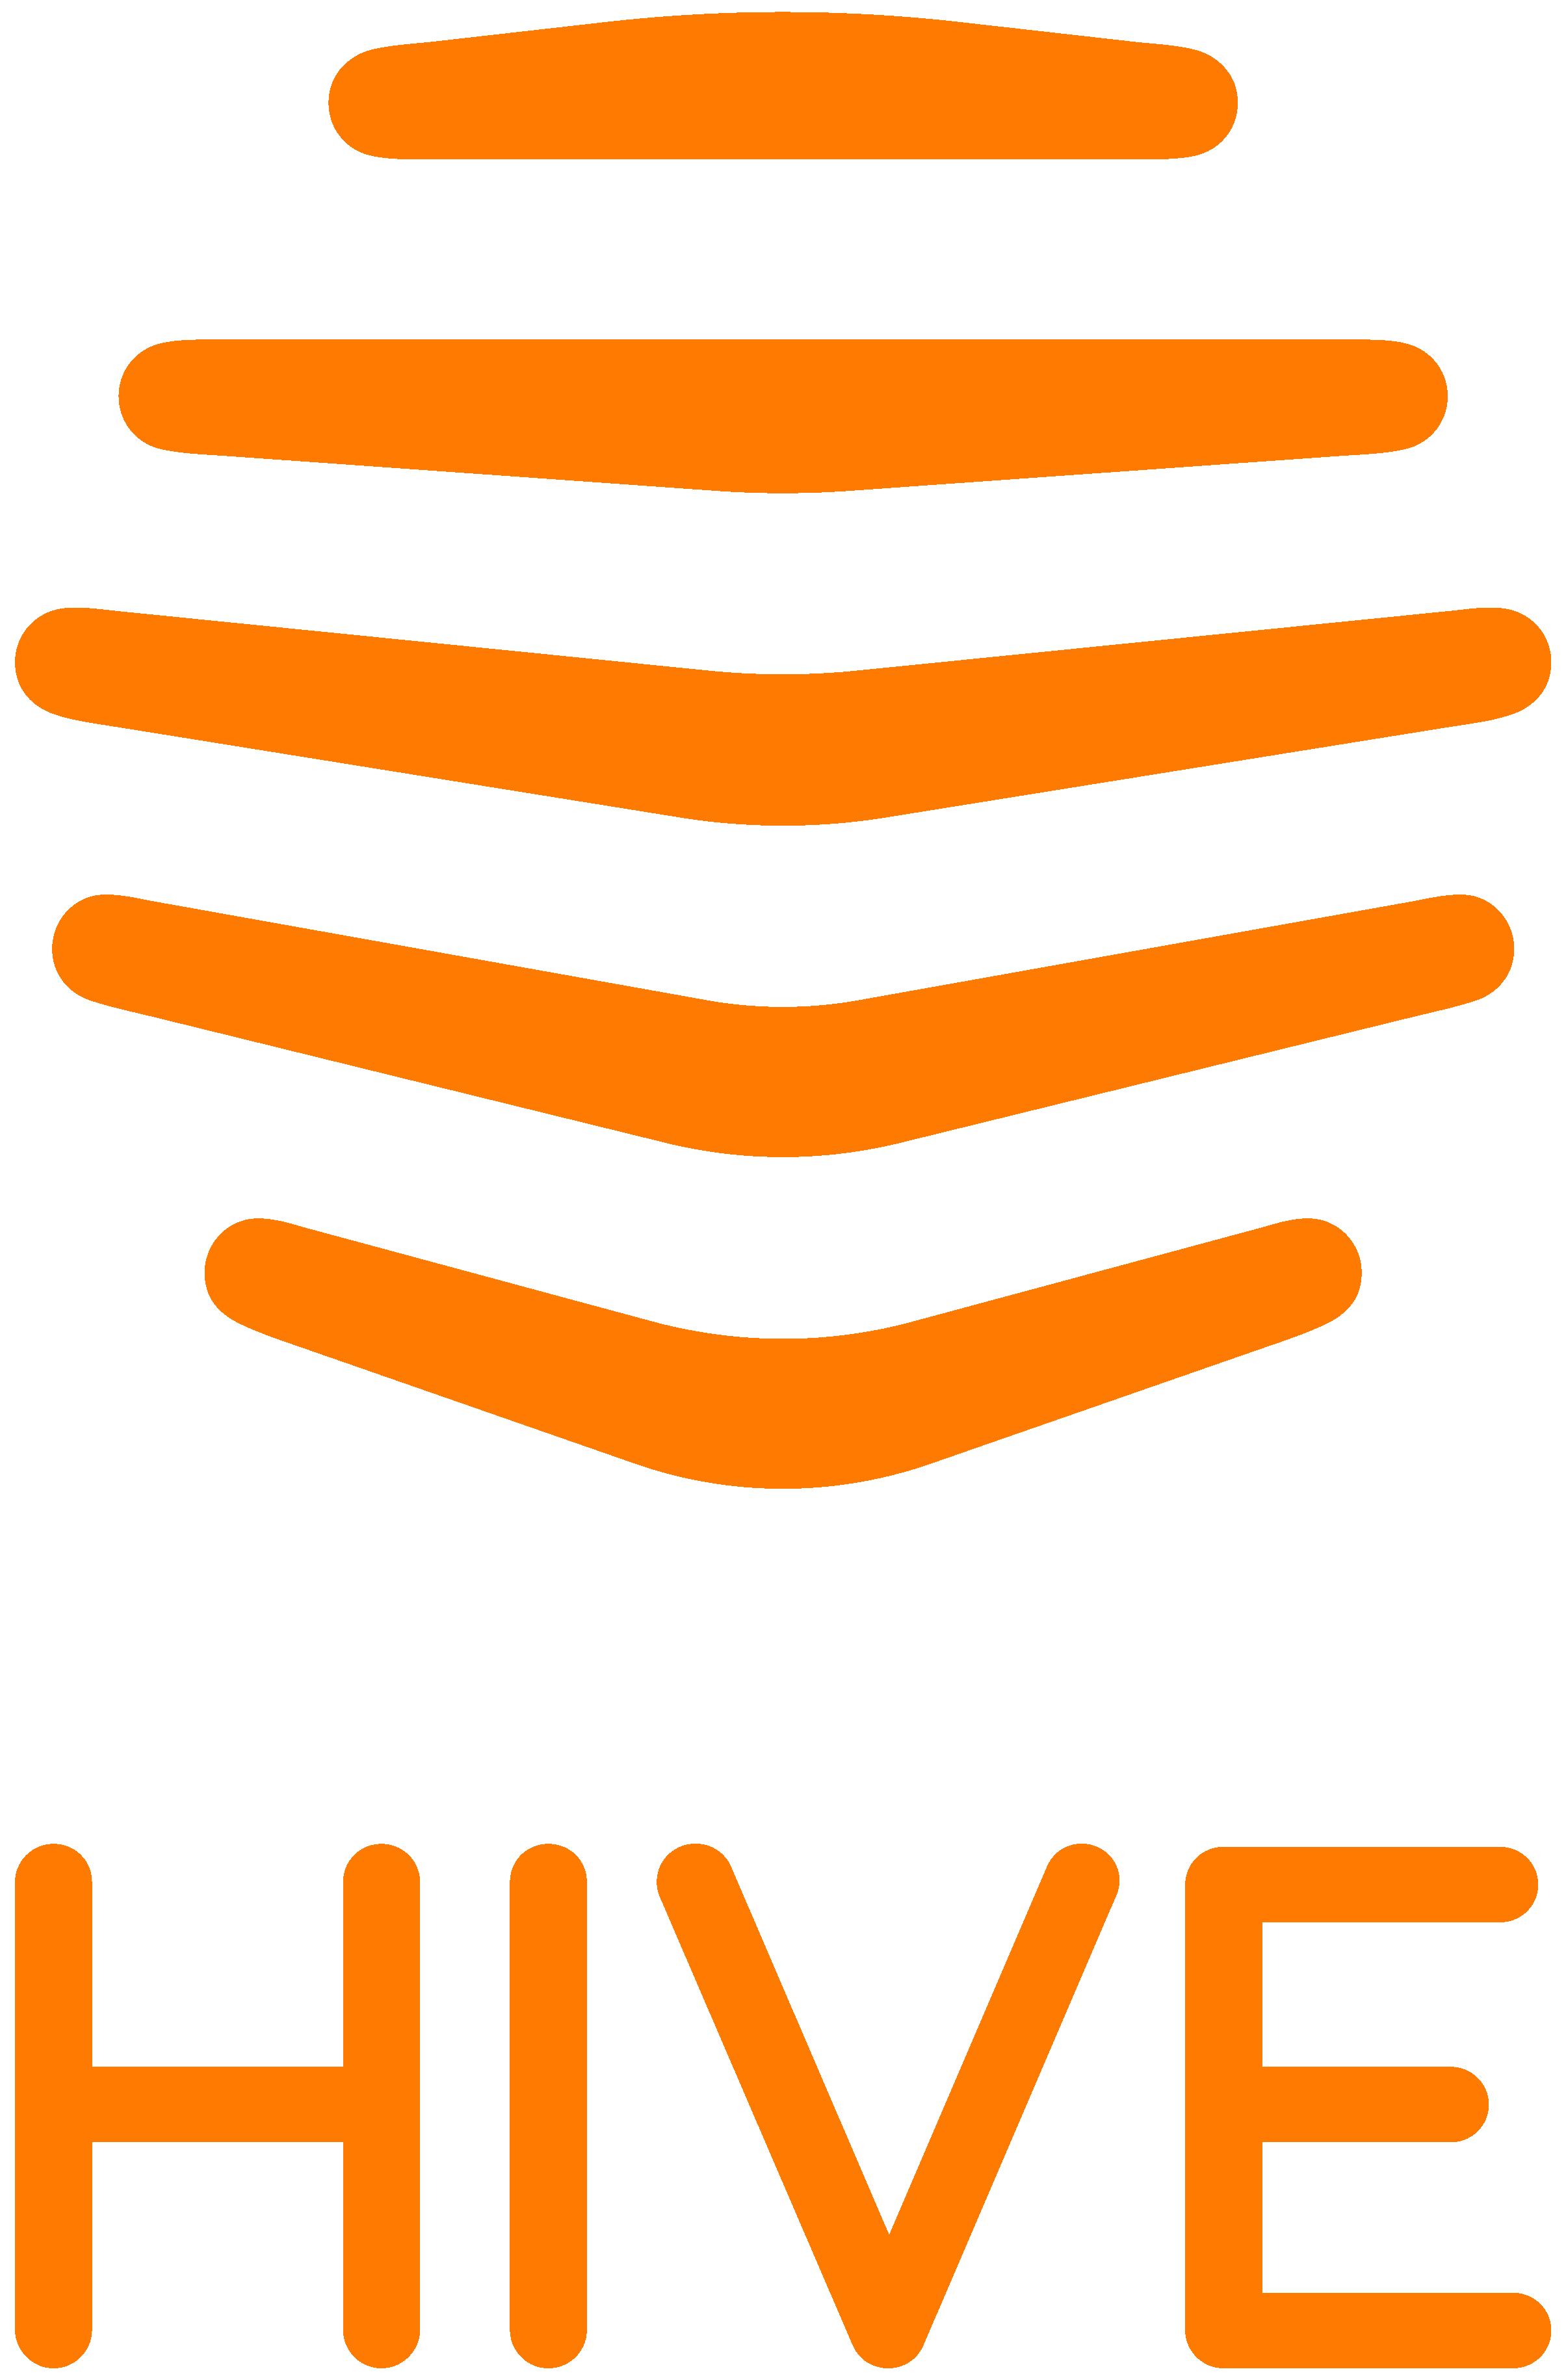 British gas logo clipart vector free download Hive Press Room | Hive Home vector free download